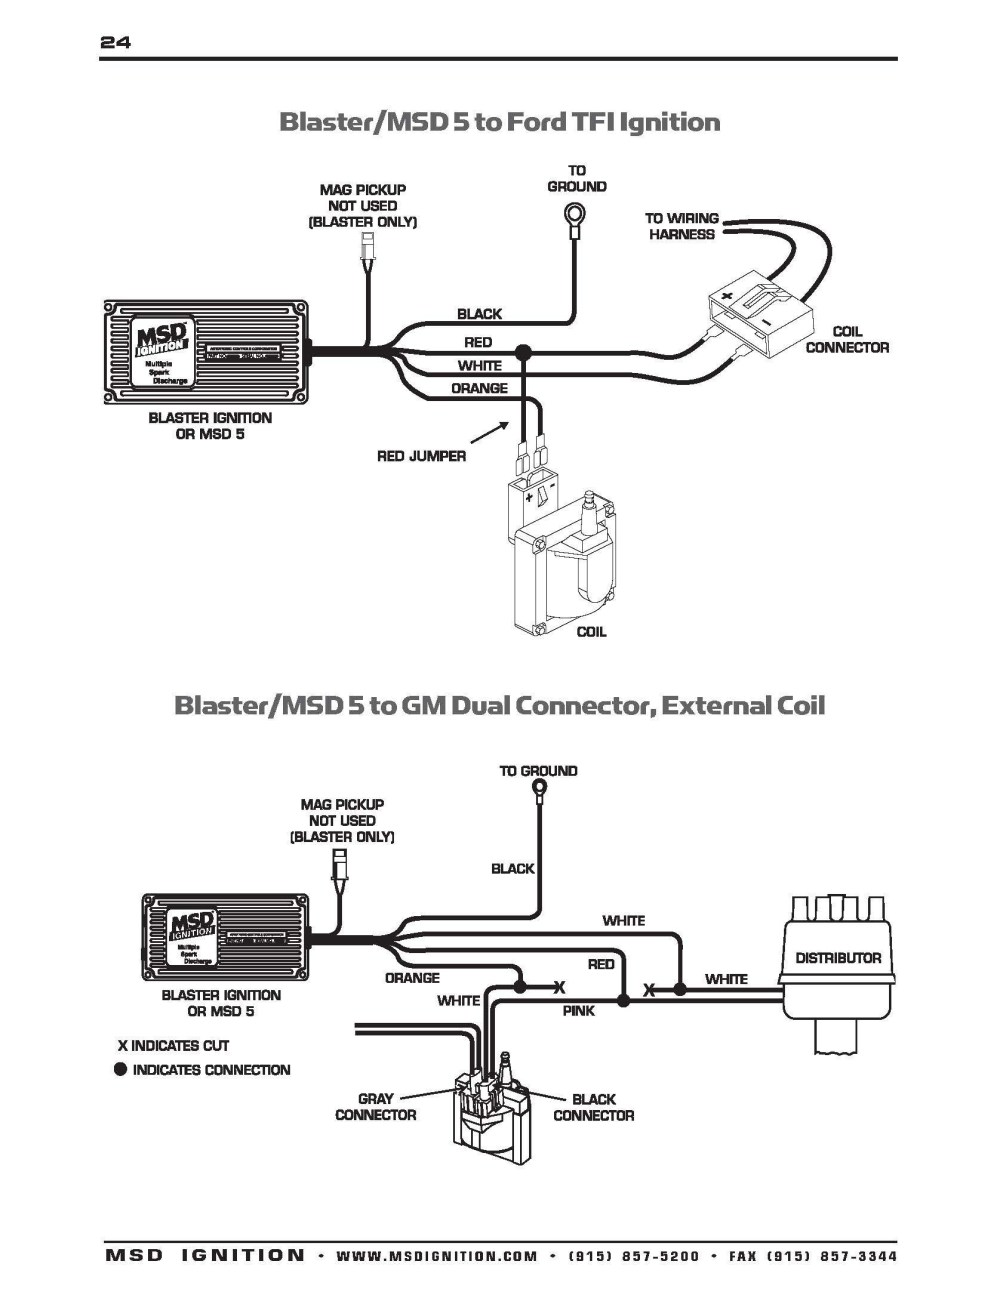 medium resolution of briggs and stratton key switch wiring diagram trusted wiring diagrams rh wiringhubme today briggs stratton alternator wiring diagram briggs stratton coil